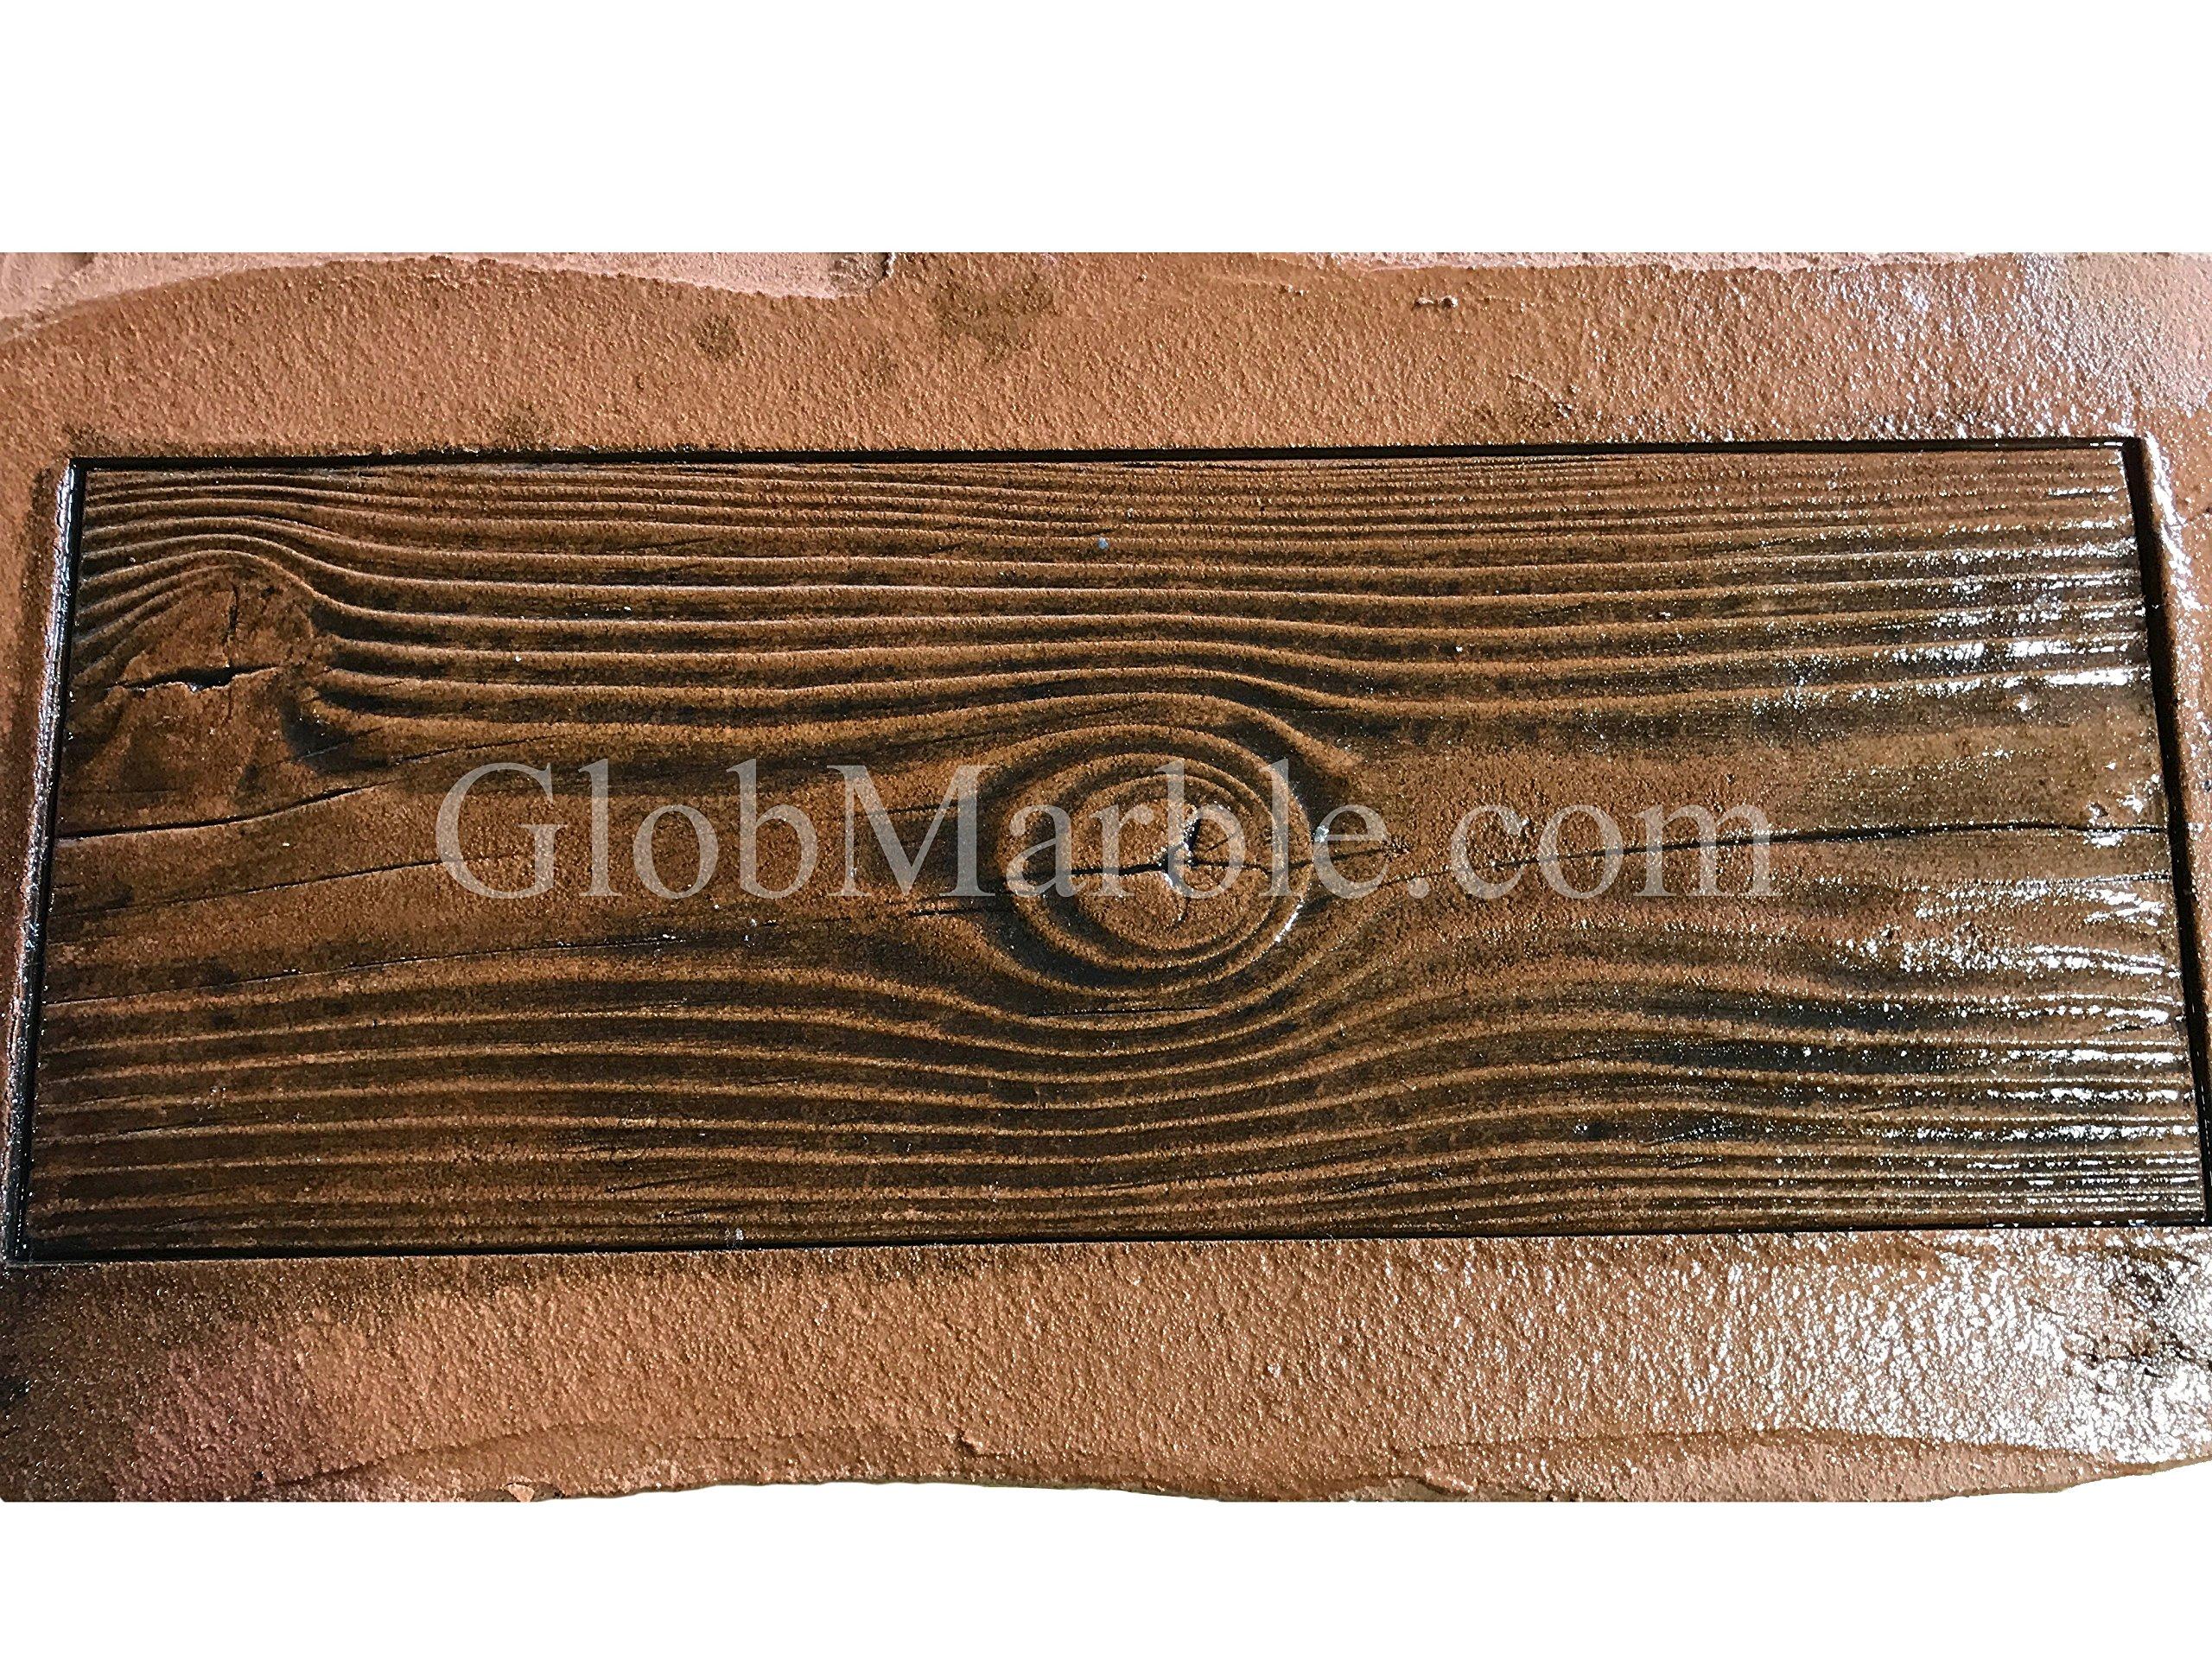 Wood Plank Concrete Stamp Set. Wood texture Stamp Mat SM 5000 S. 5 pieces Woodgrain